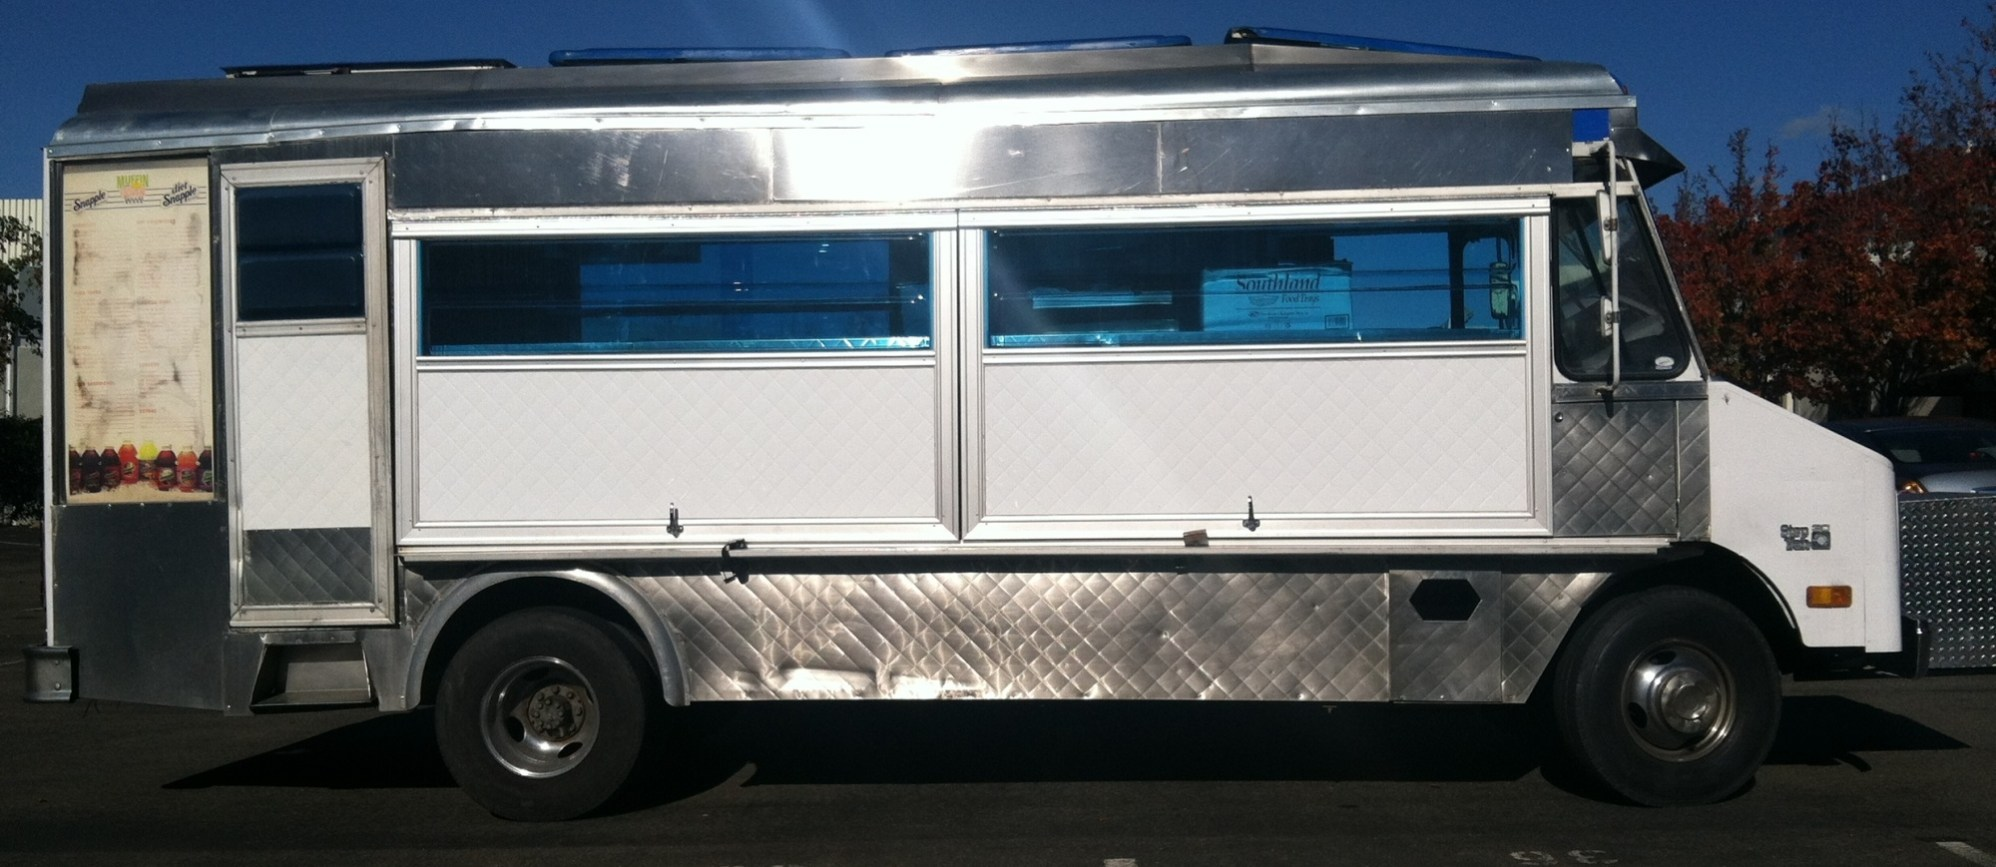 five star food truck wrap-08